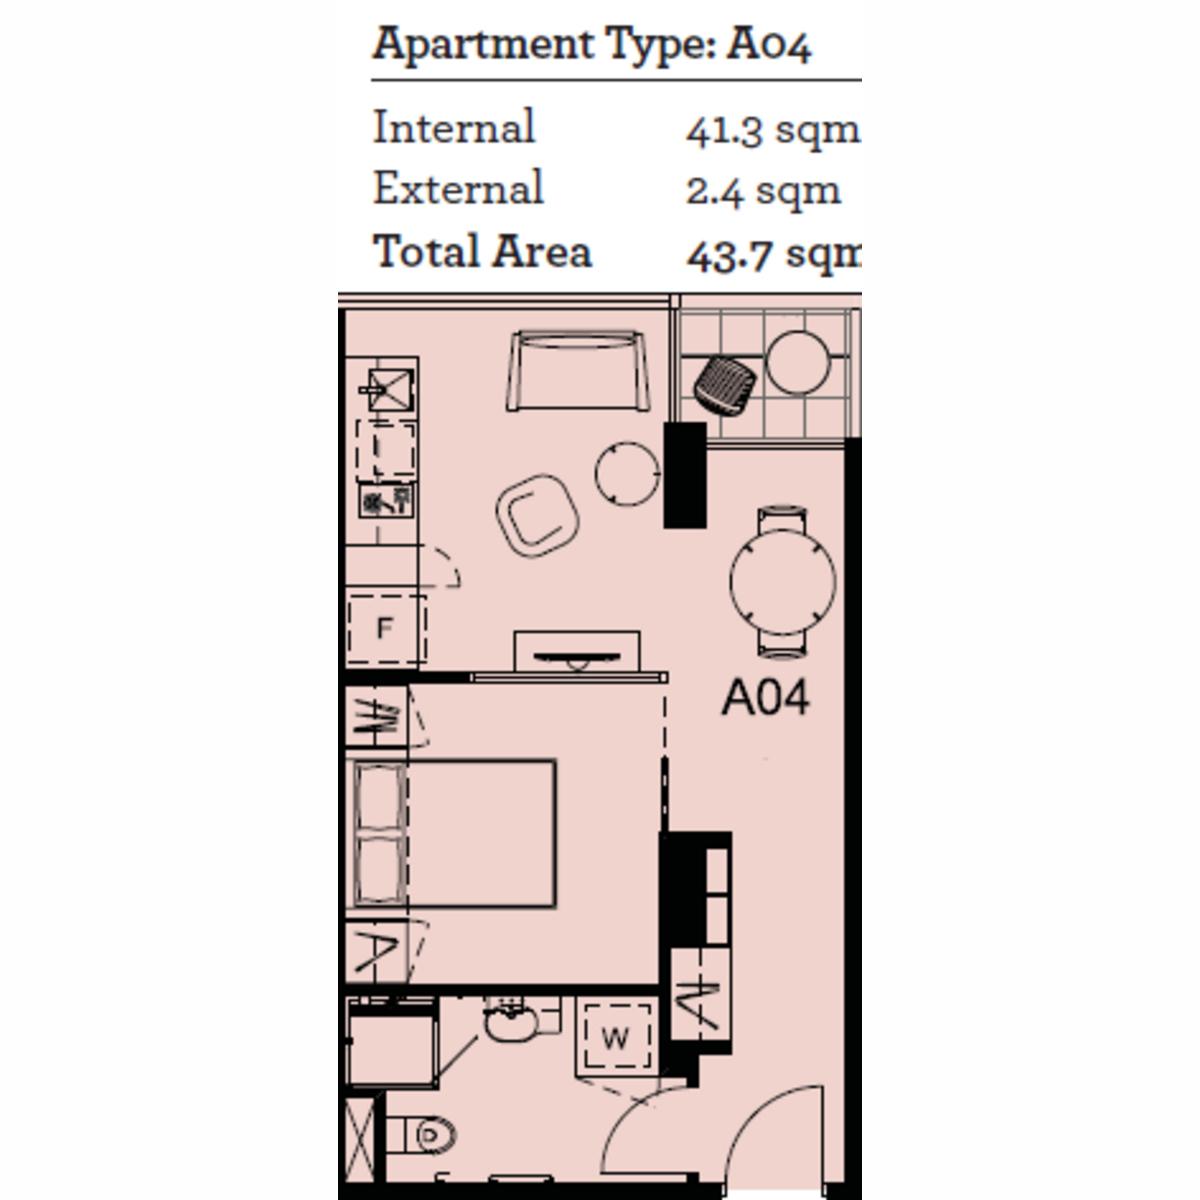 19th Floor 1bed / 1bath Gem at 27 Little Collins Street